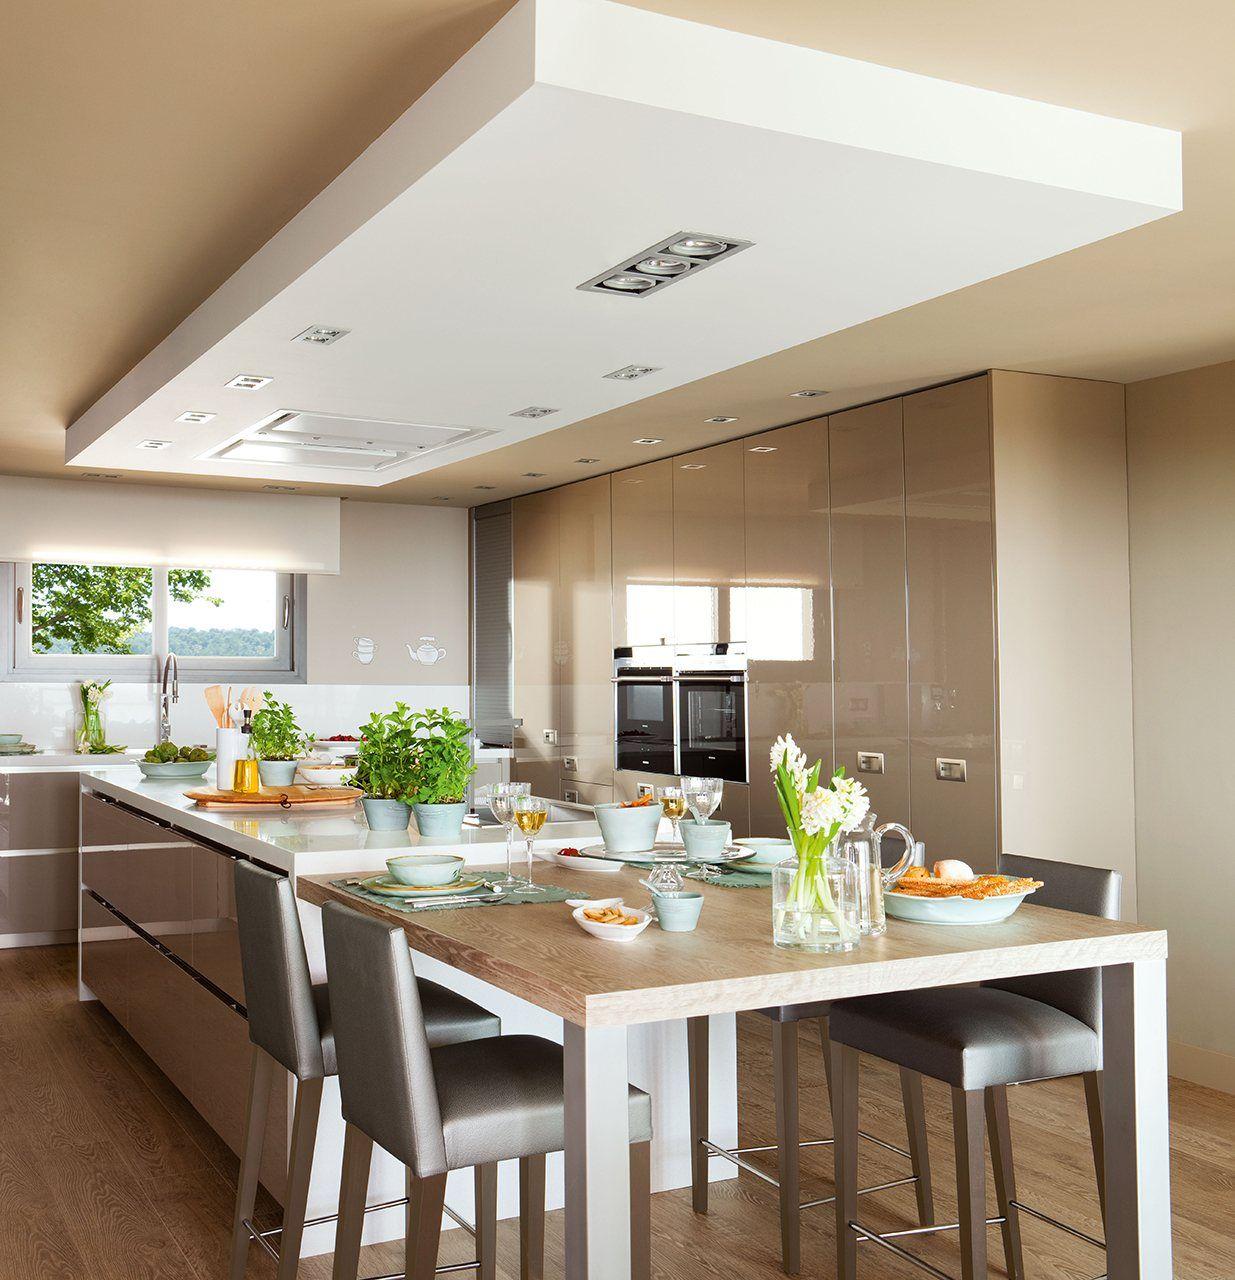 Claves para elegir la campana de tu cocina home pinterest ceiling kitchens and kitchen design - Campana de la cocina ...